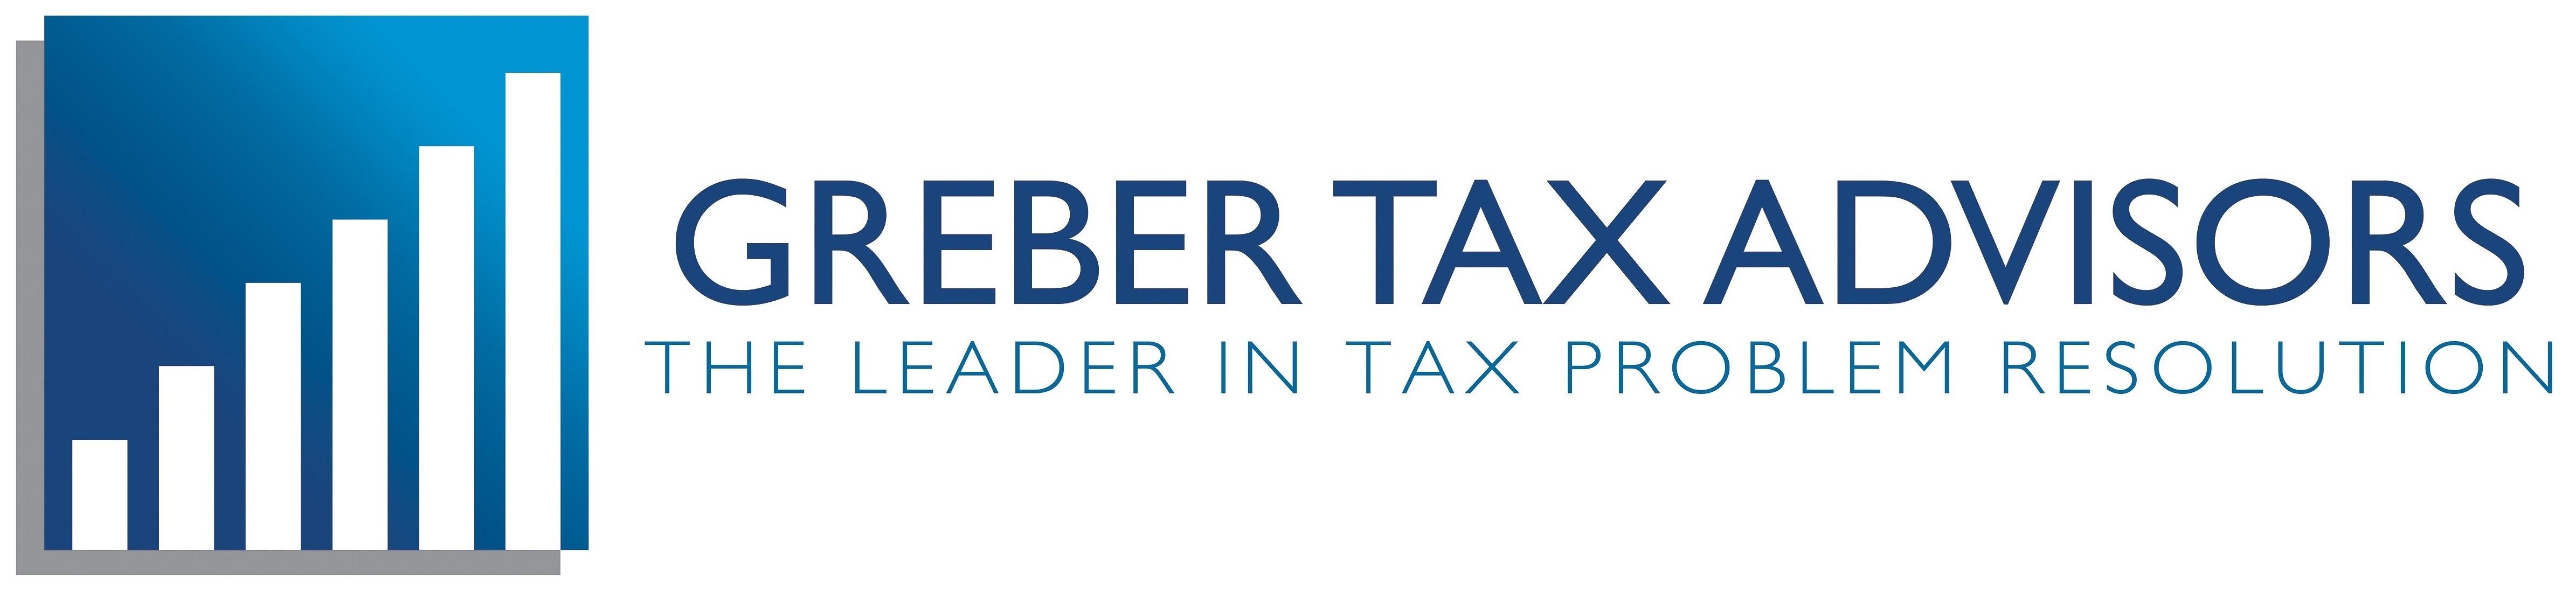 Greber Tax Advisors